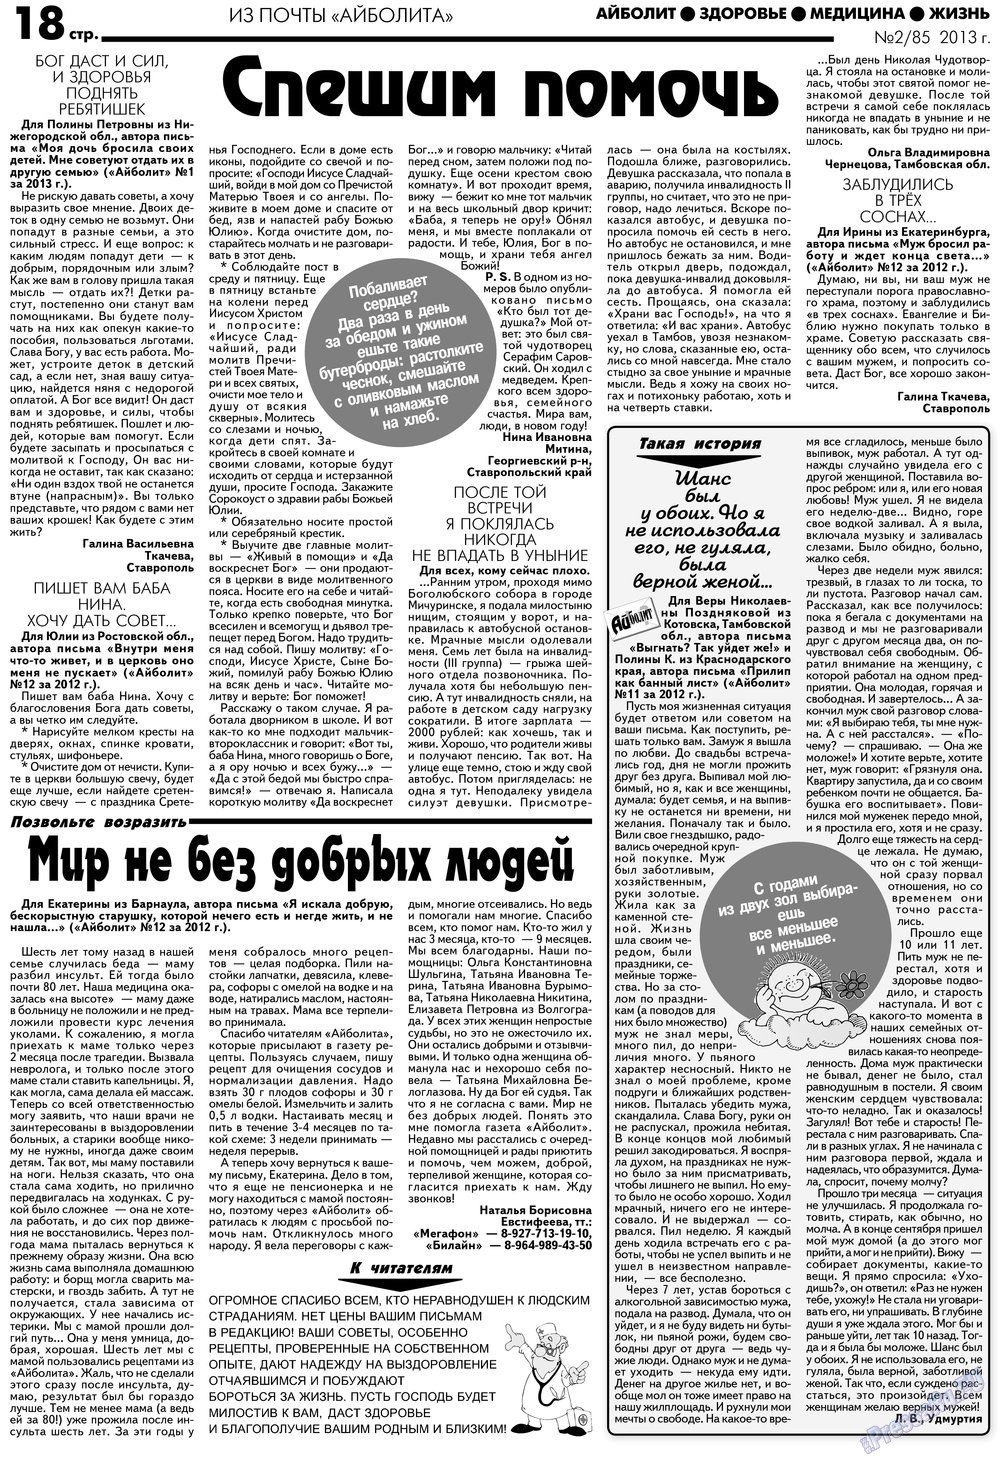 АйБолит (газета). 2013 год, номер 2, стр. 18